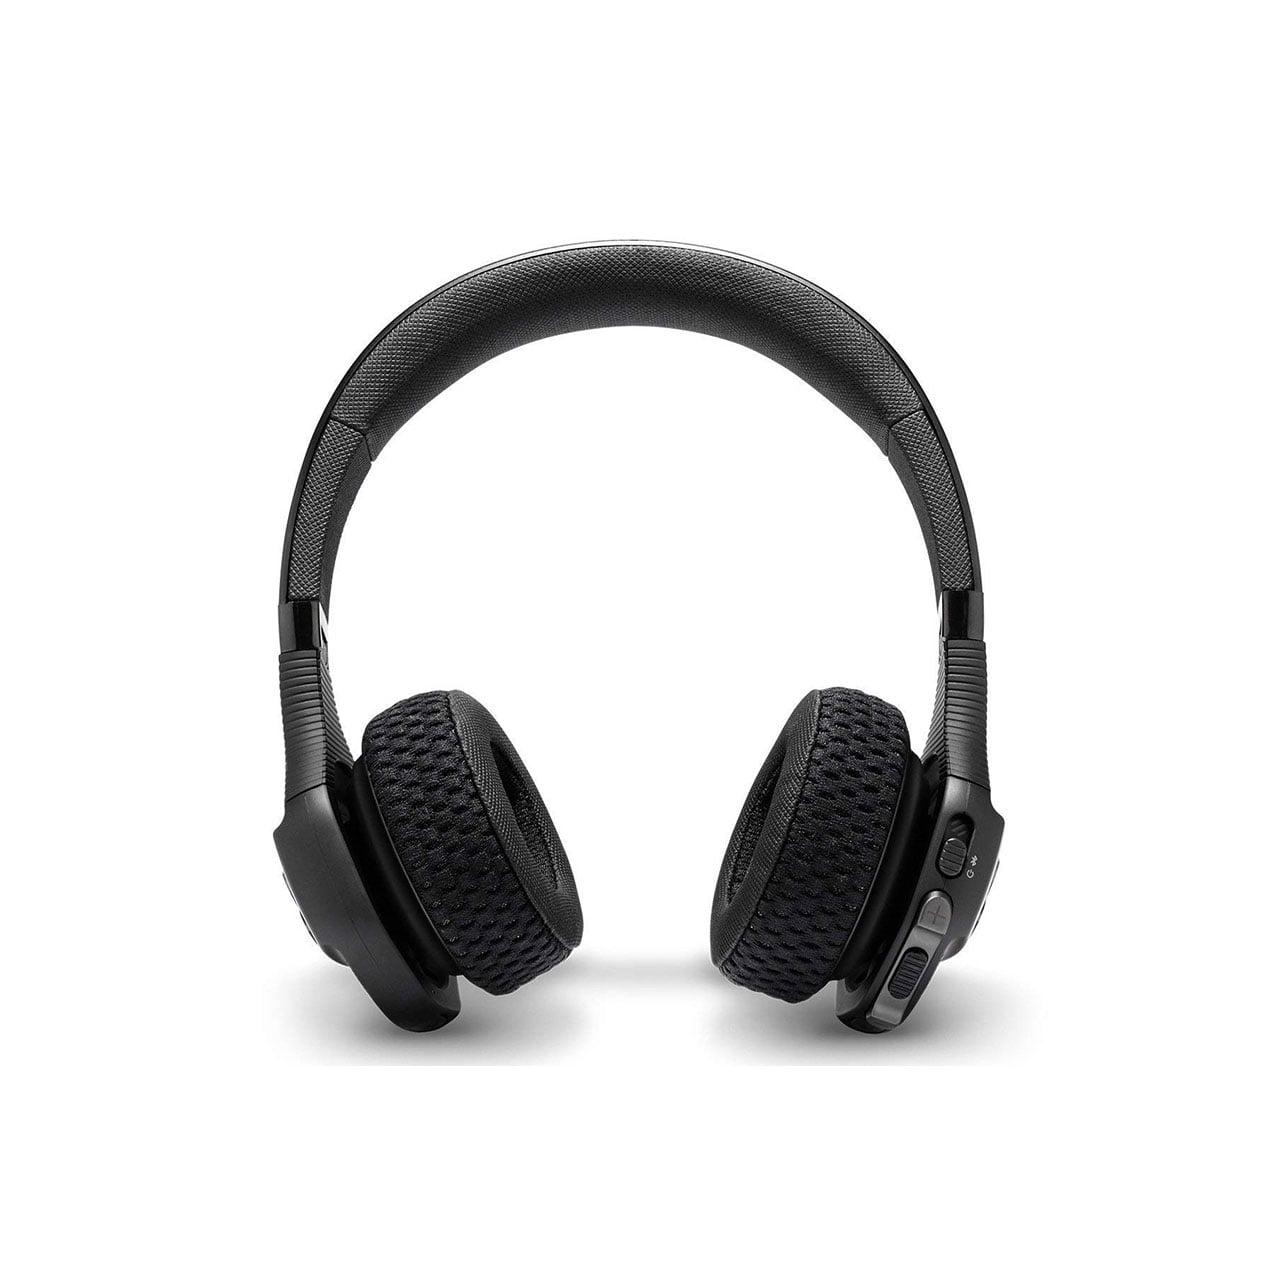 588cf81dd2d Under Armour On-Ear Sport Wireless Train Headphones by JBL - Walmart.com